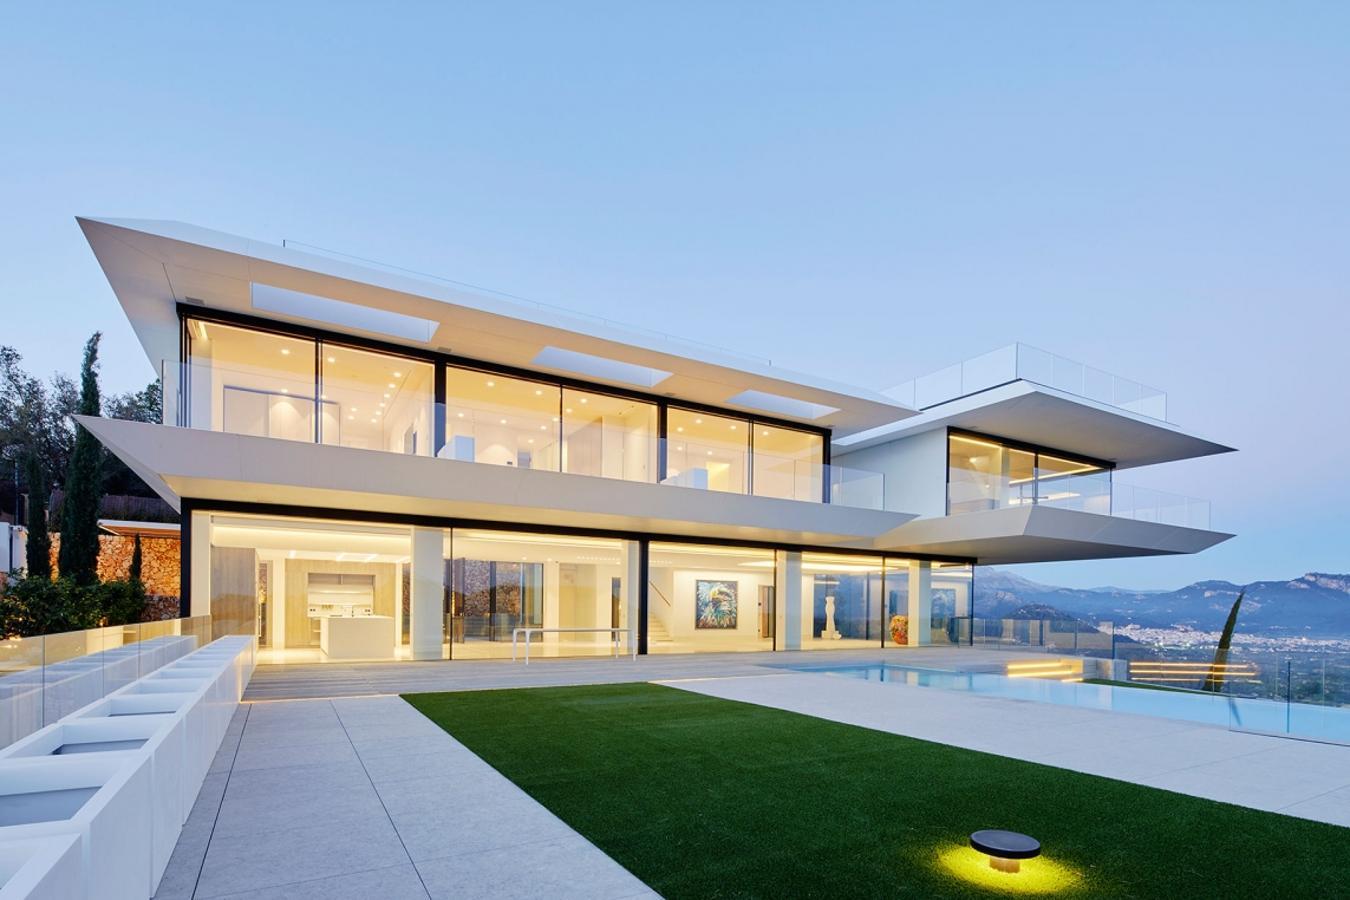 Est en mallorca la mejor casa del mundo - Arquitectos en mallorca ...